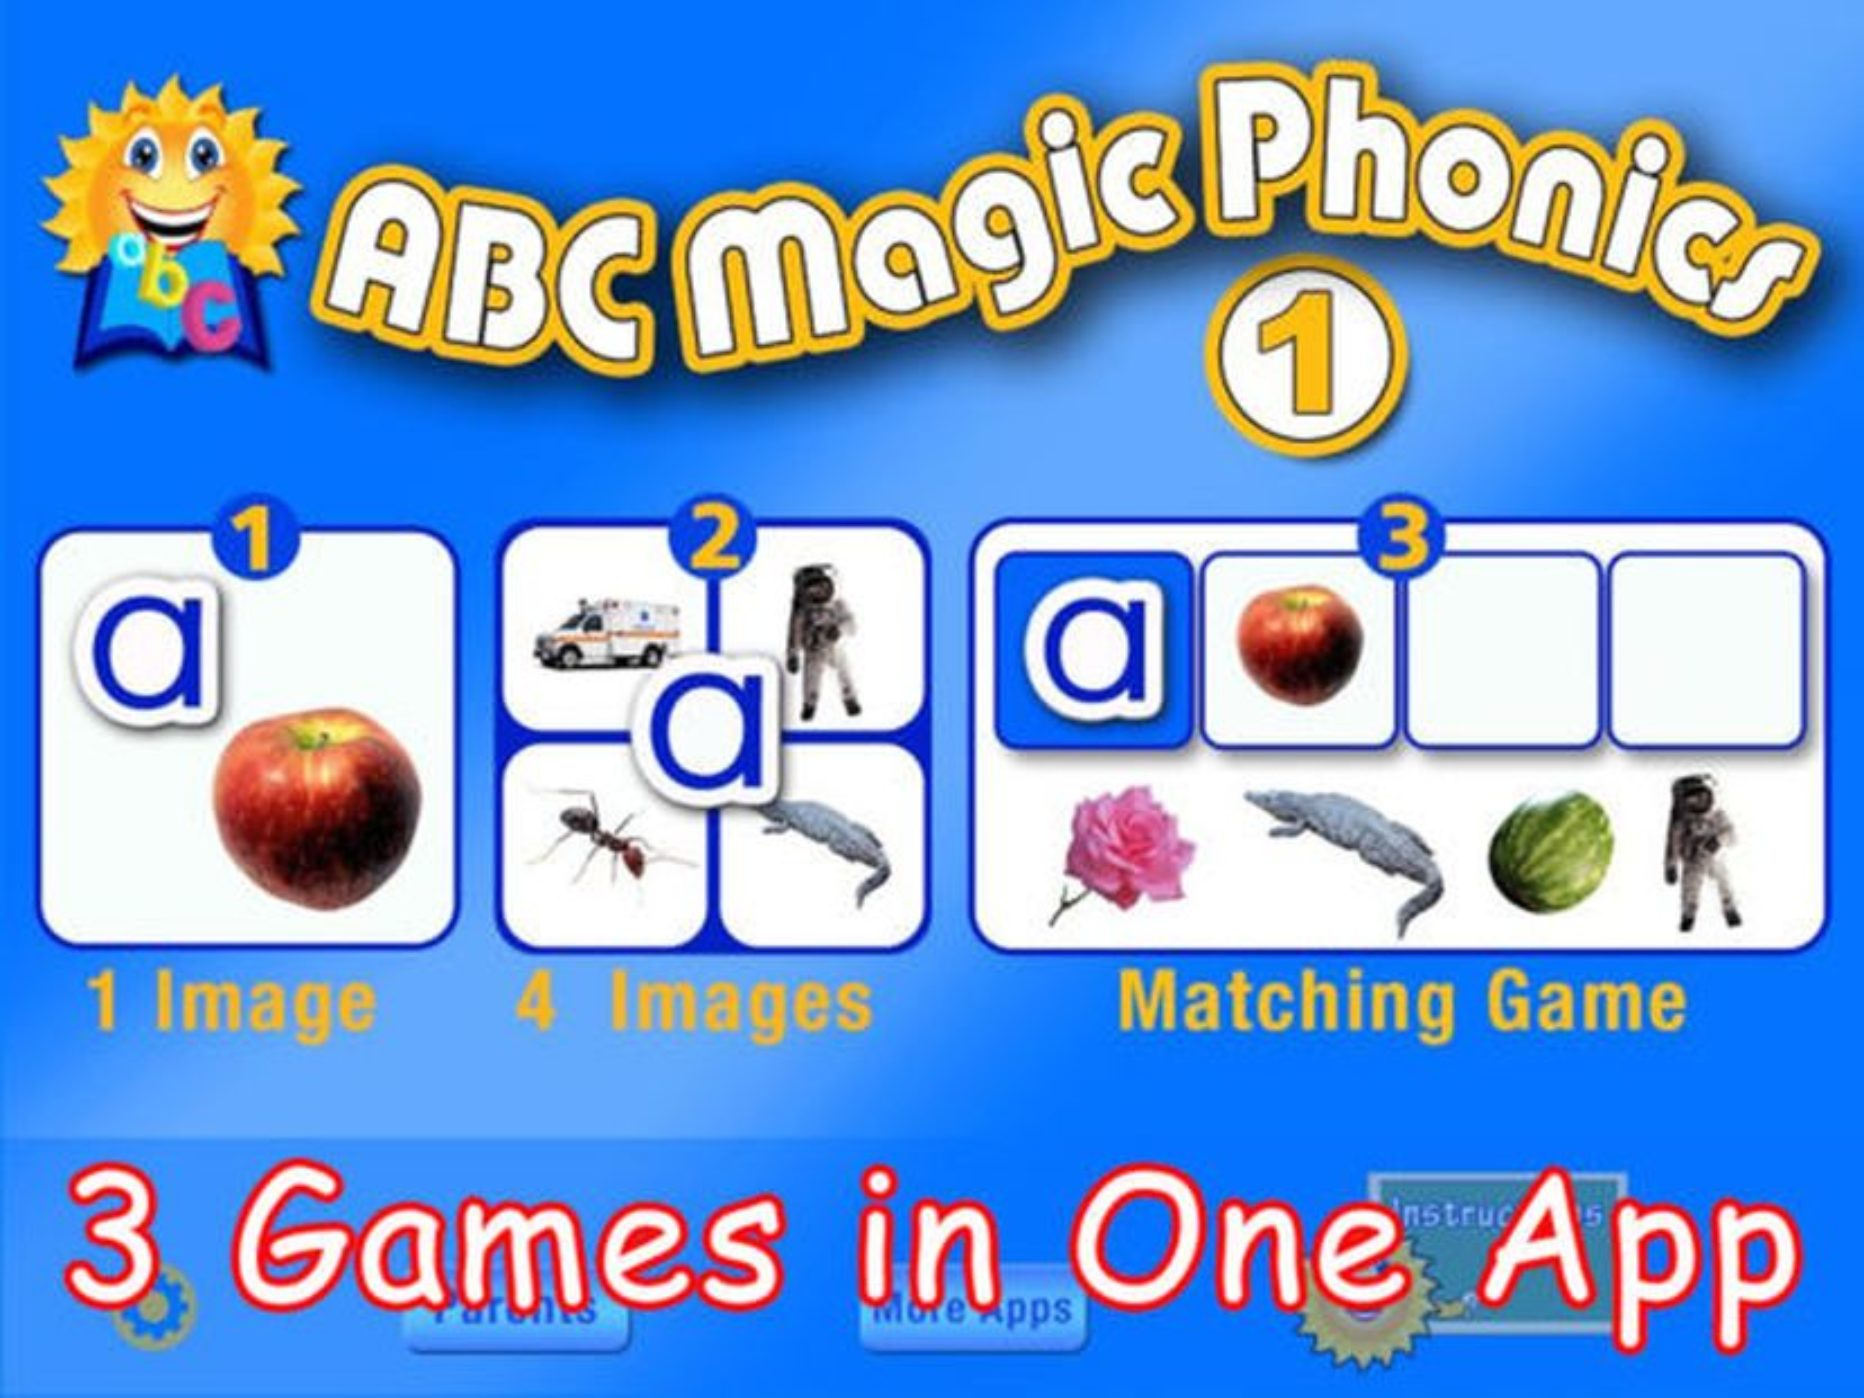 ABC Magic Phonics App Review